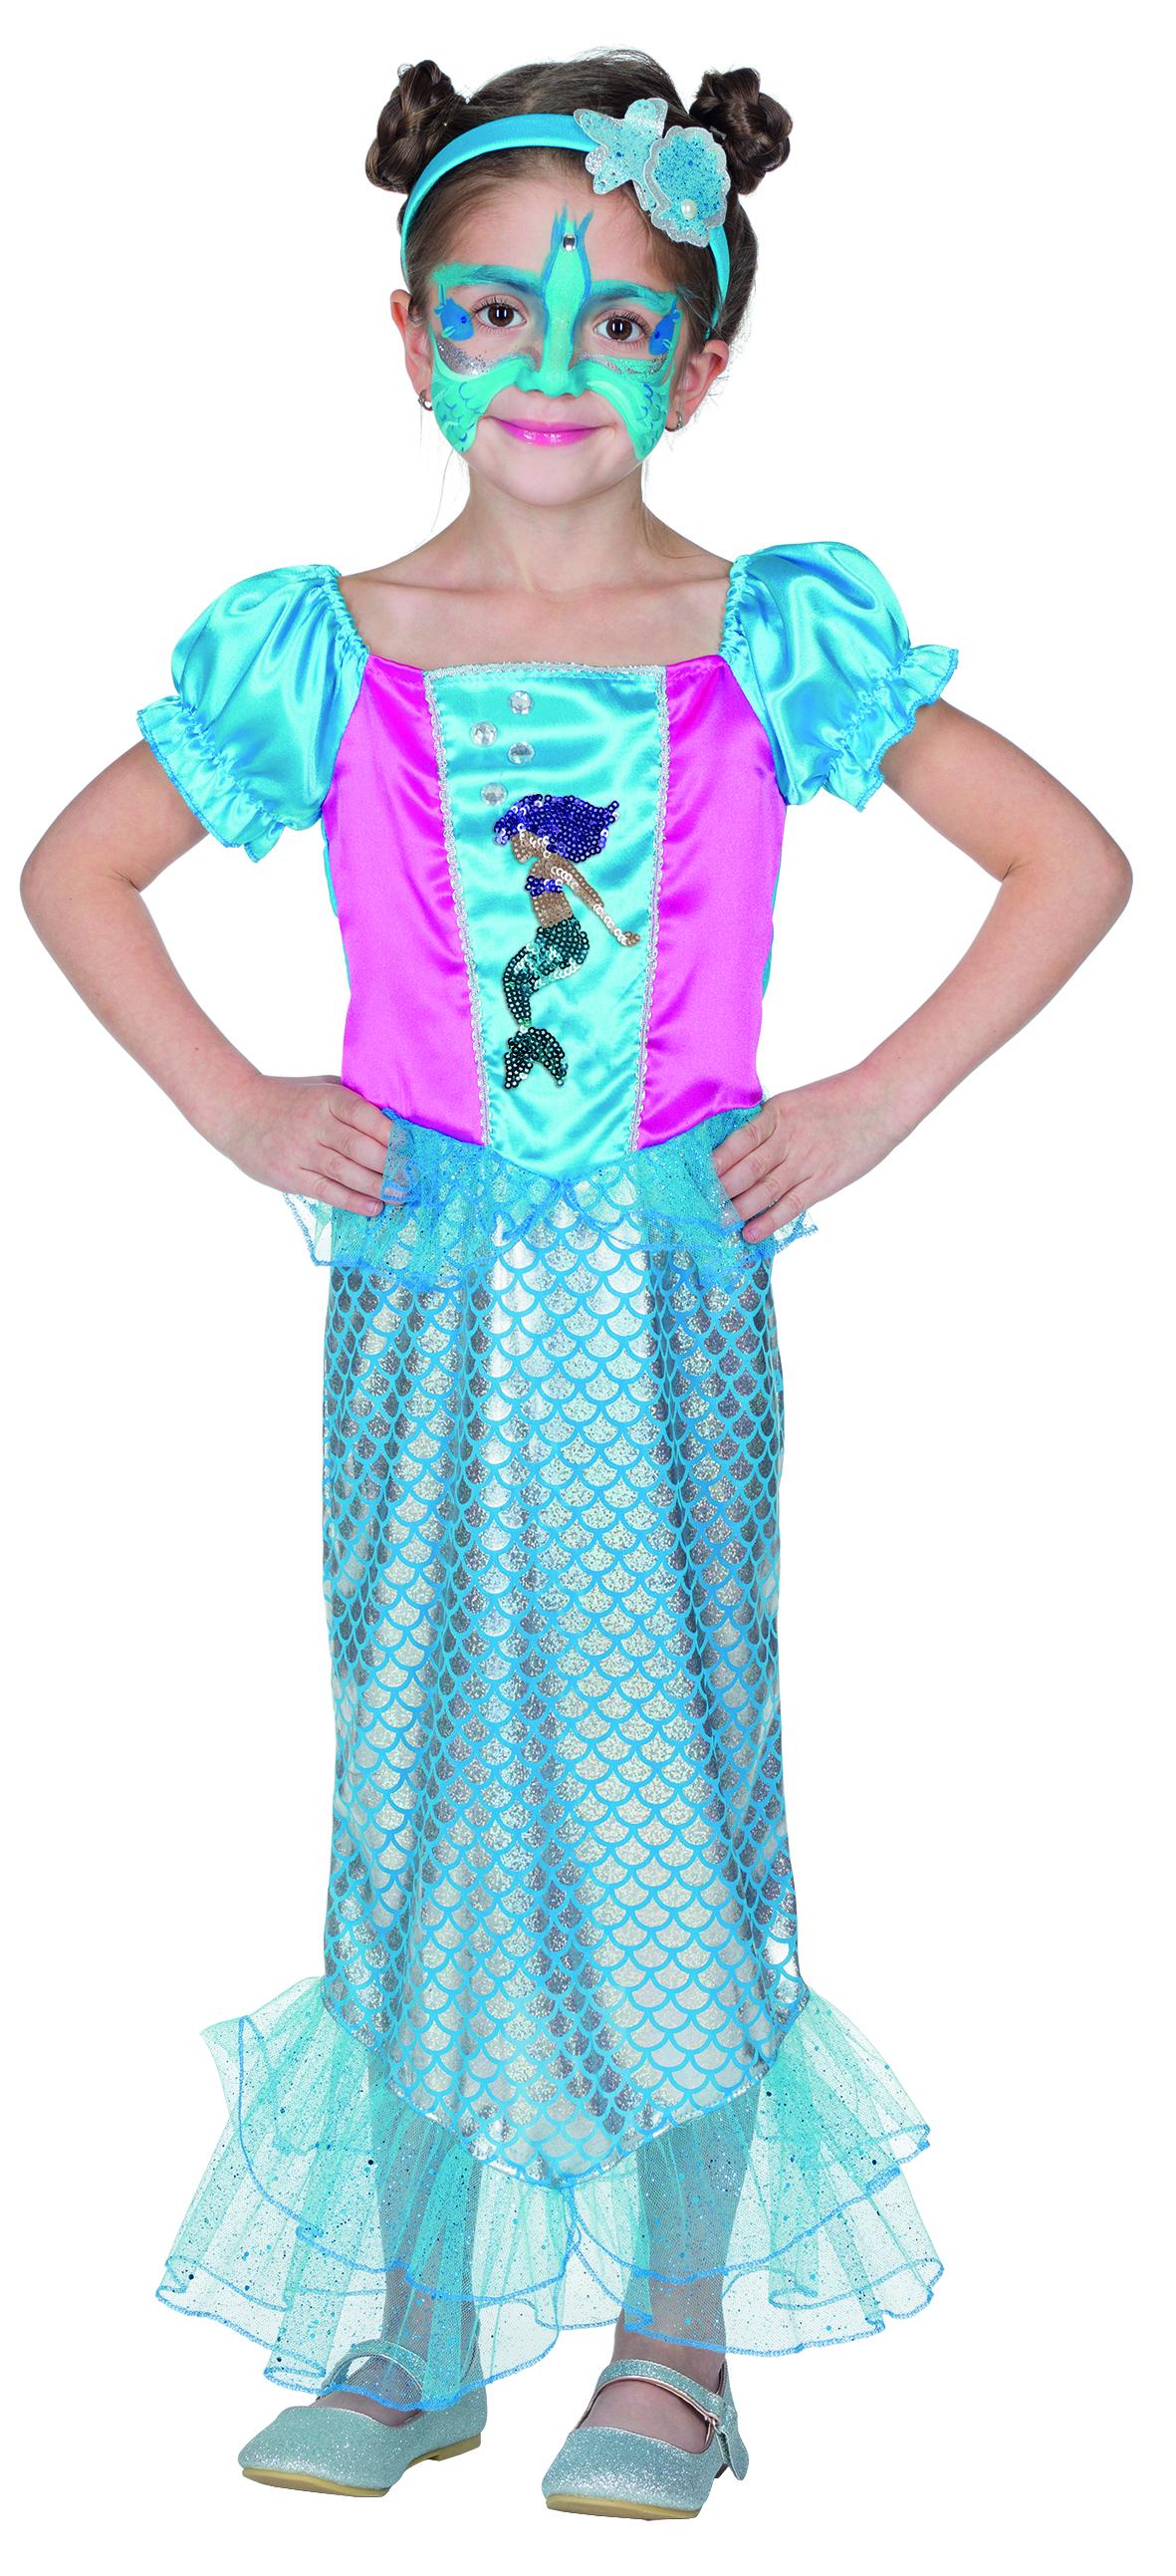 Meerjungfrau Kleid Bubbles bei Party Schlaudt Wiesbaden kaufen